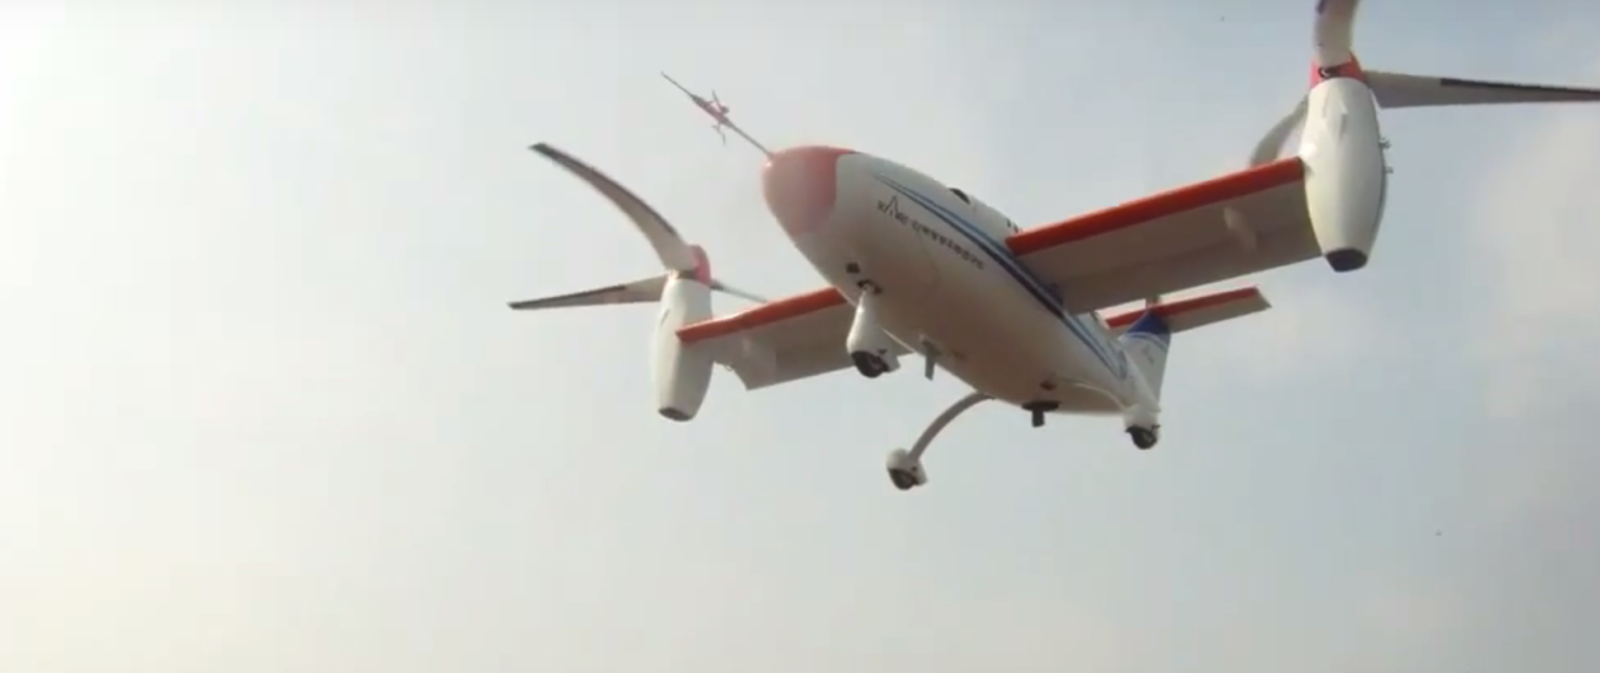 South Korea Is Building a 300-Mph Tiltrotor Drone